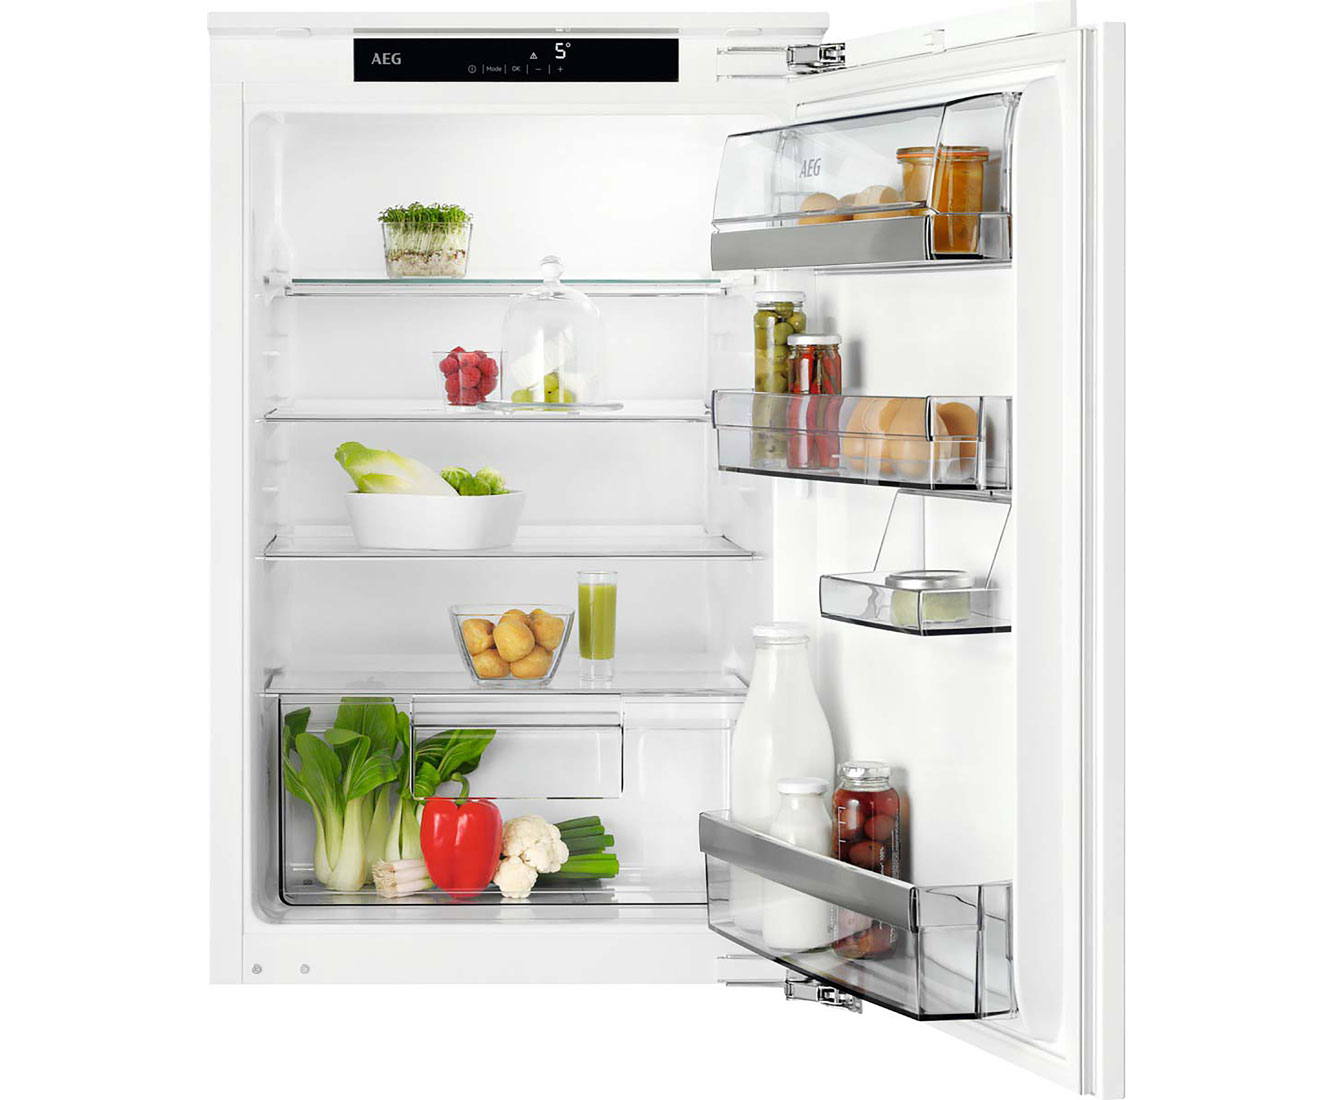 Gorenje Kühlschrank Orb 153 A 154 Cm Hoch : Rabatt preisvergleich haushalt u e großgeräte u e kühlschränke